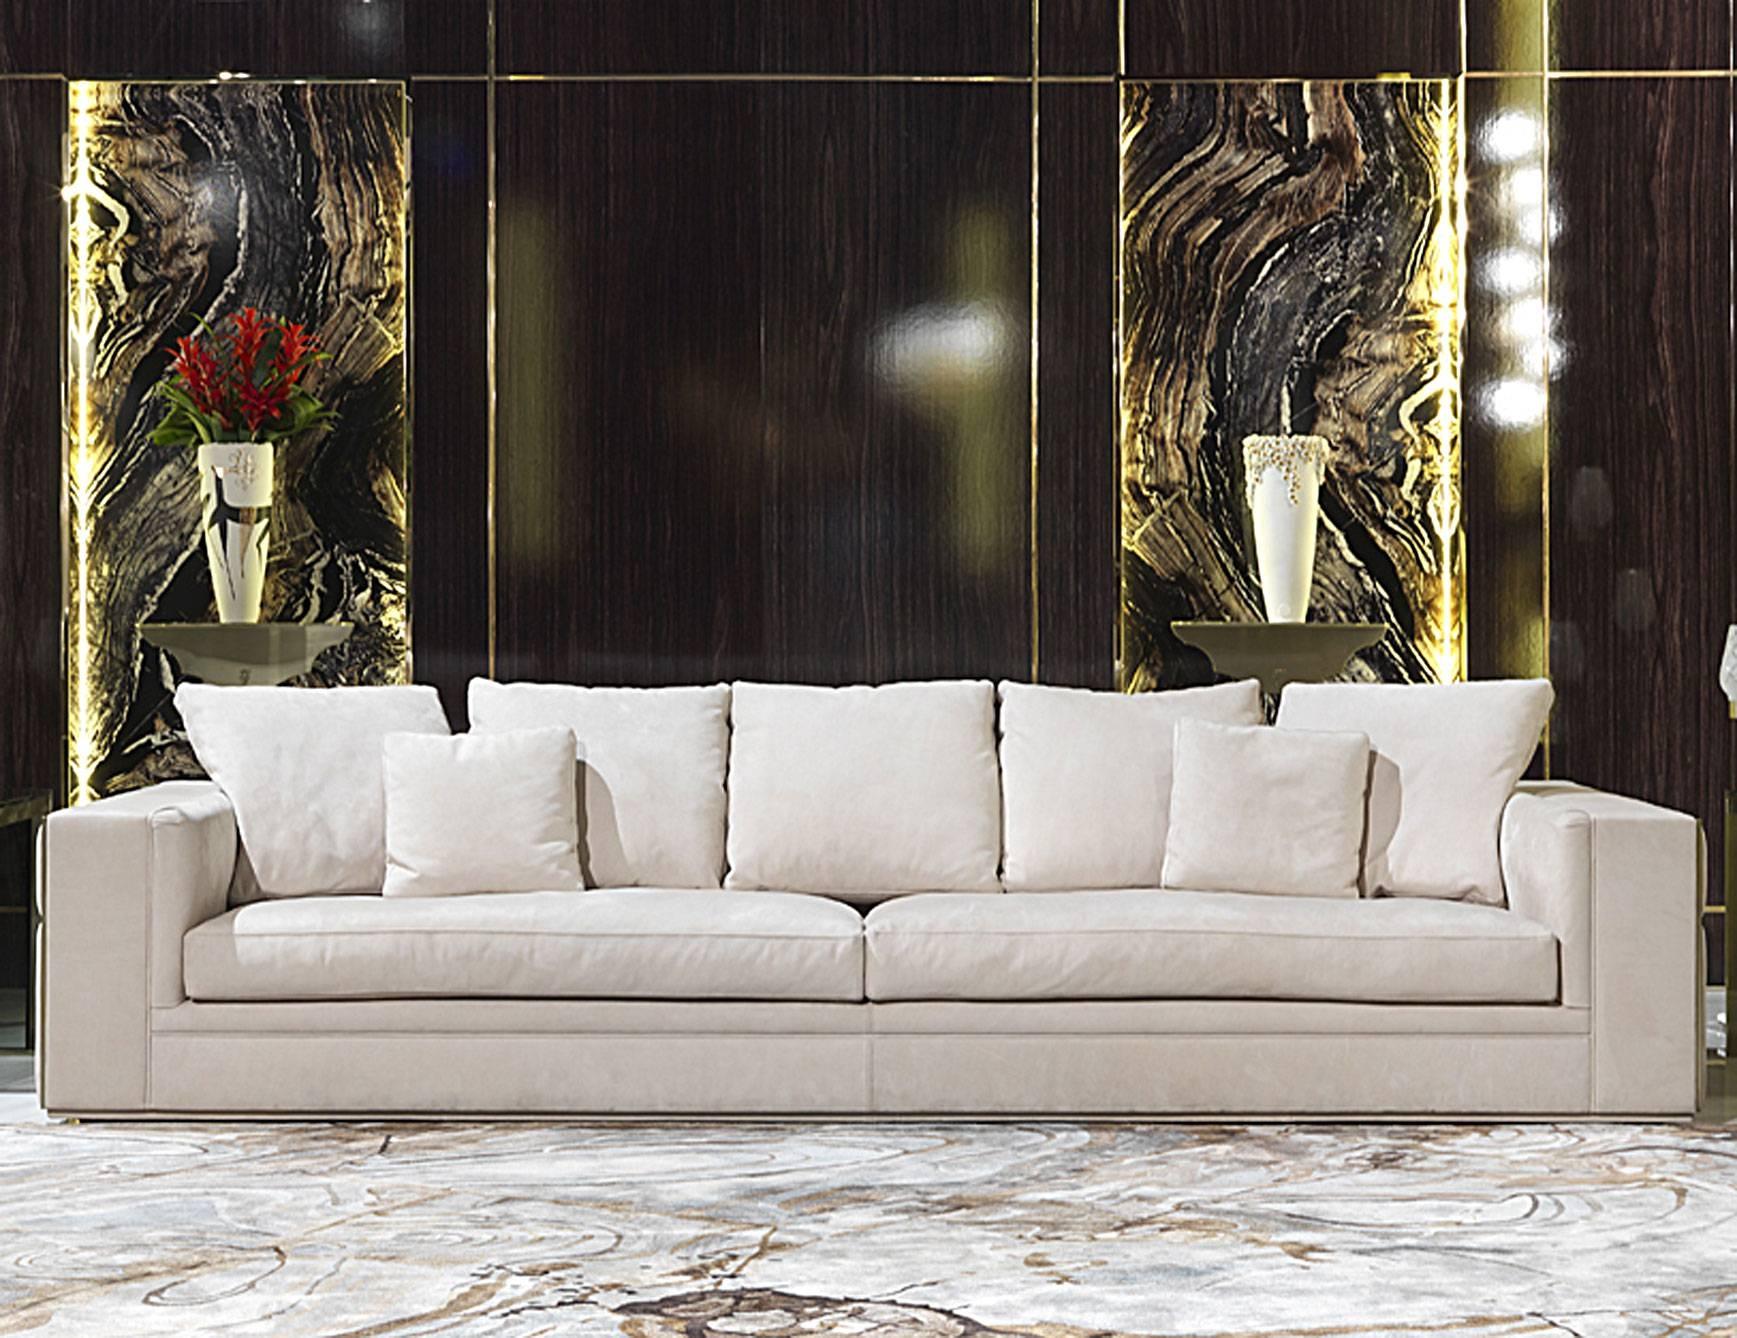 clic design sofa berkline reclining parts high end top 60 best famous legendary